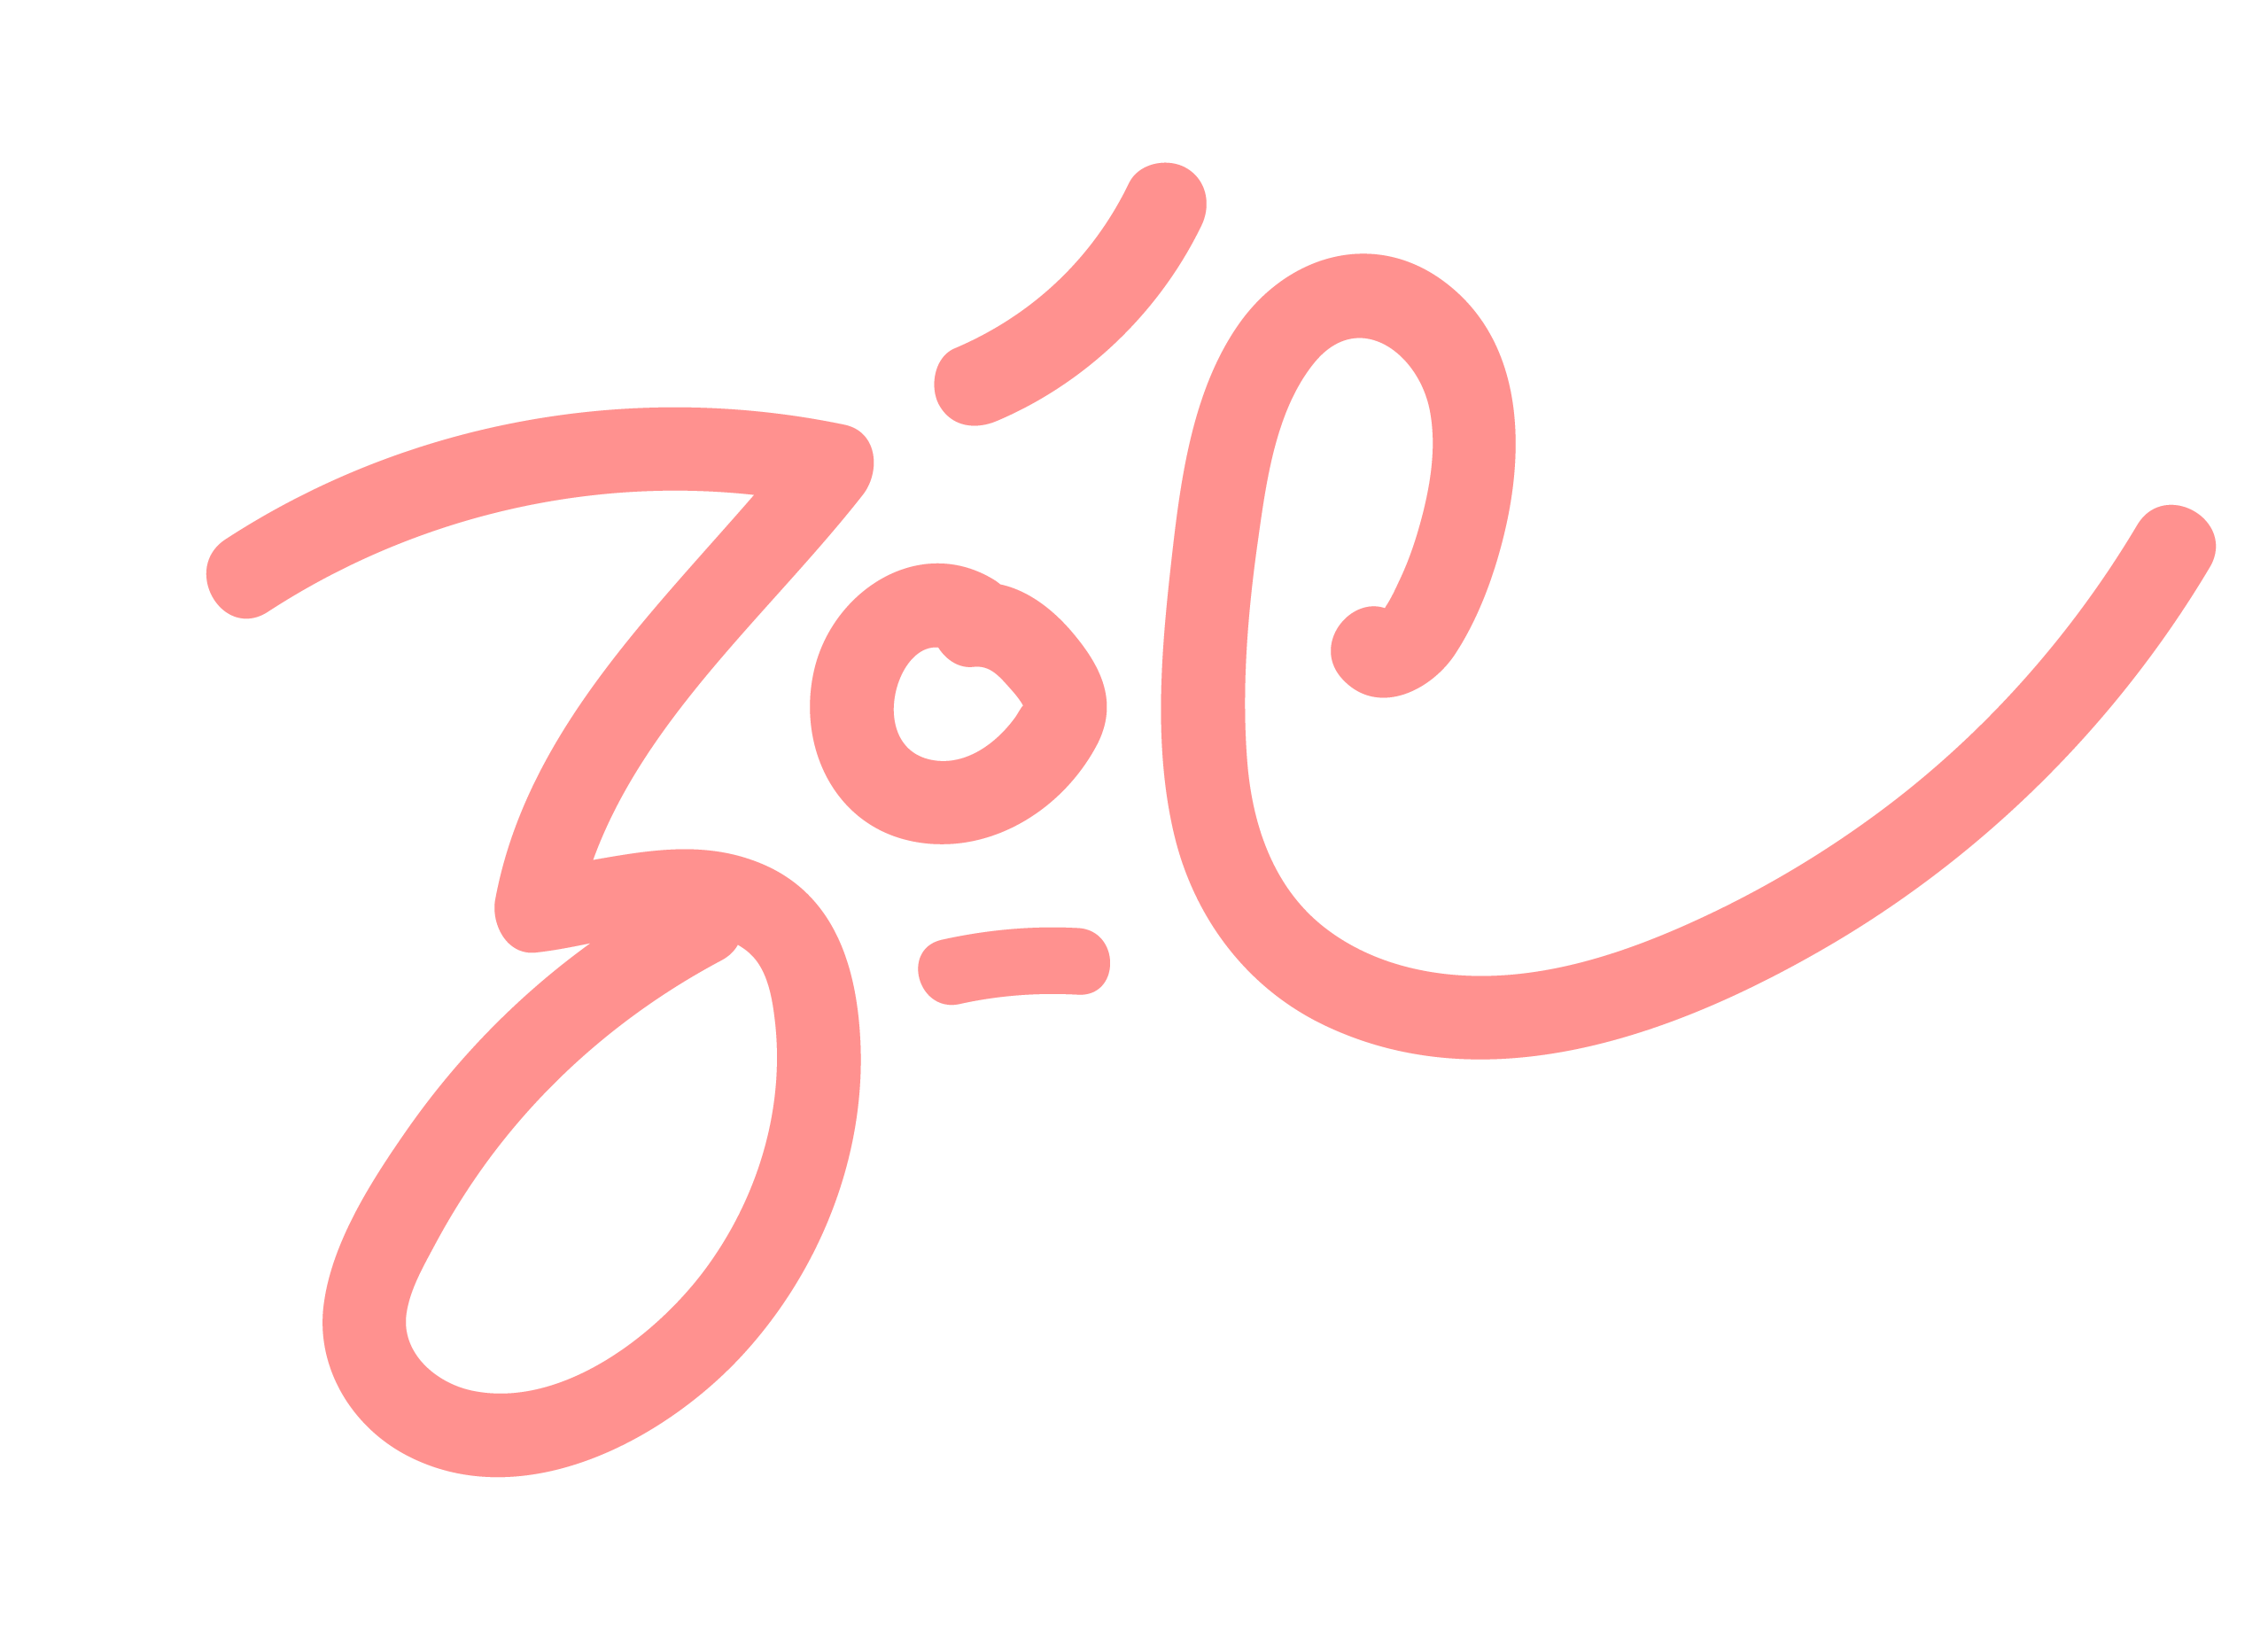 Zoé Dubois